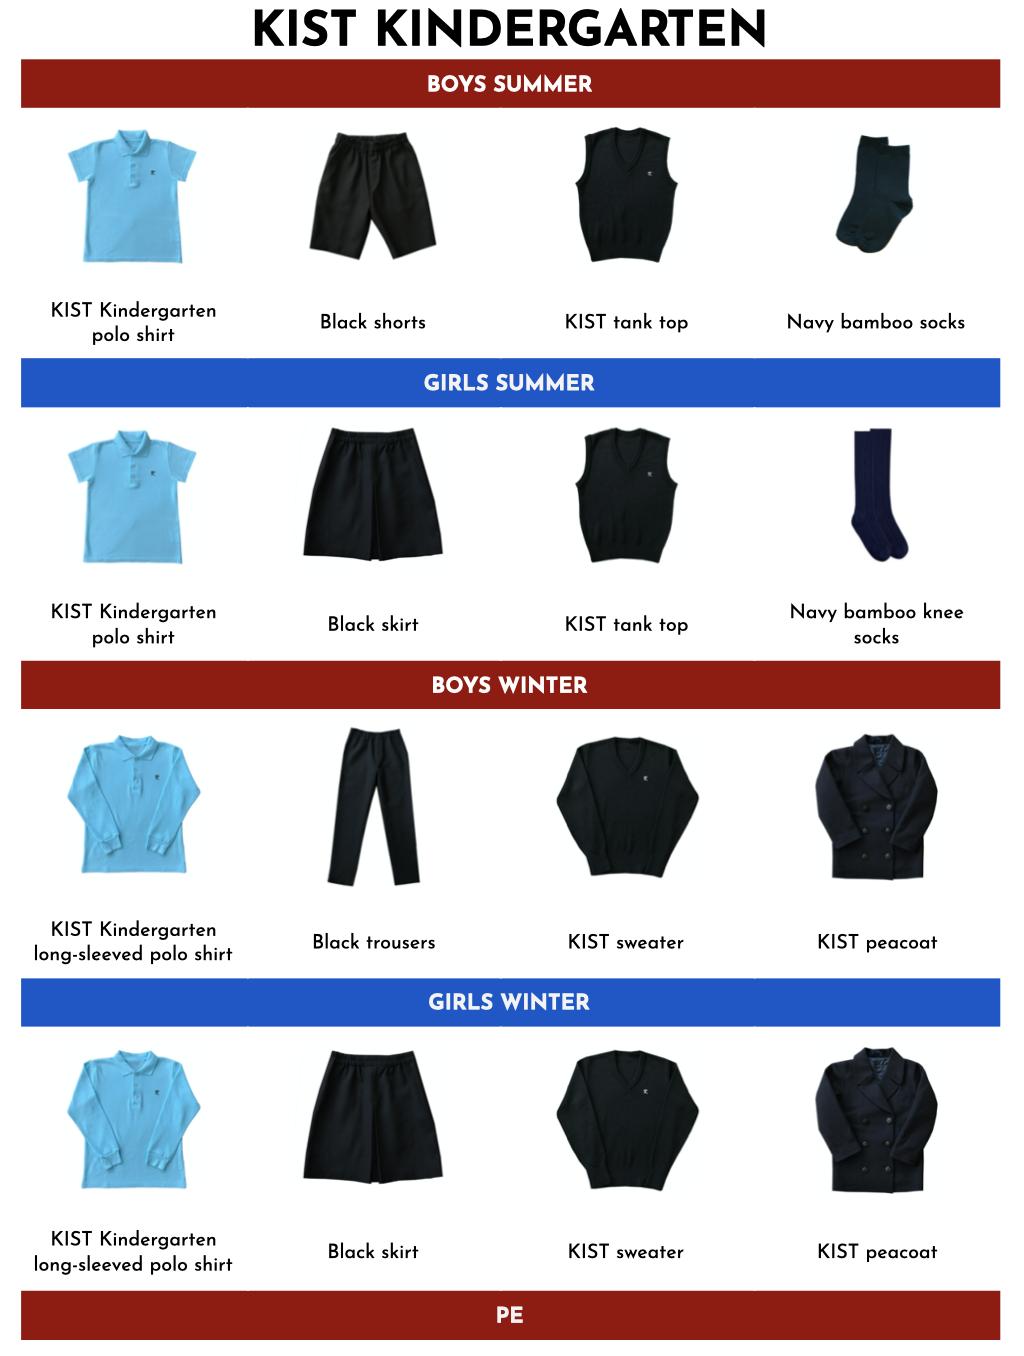 kist-old-uniform-guide-5.png